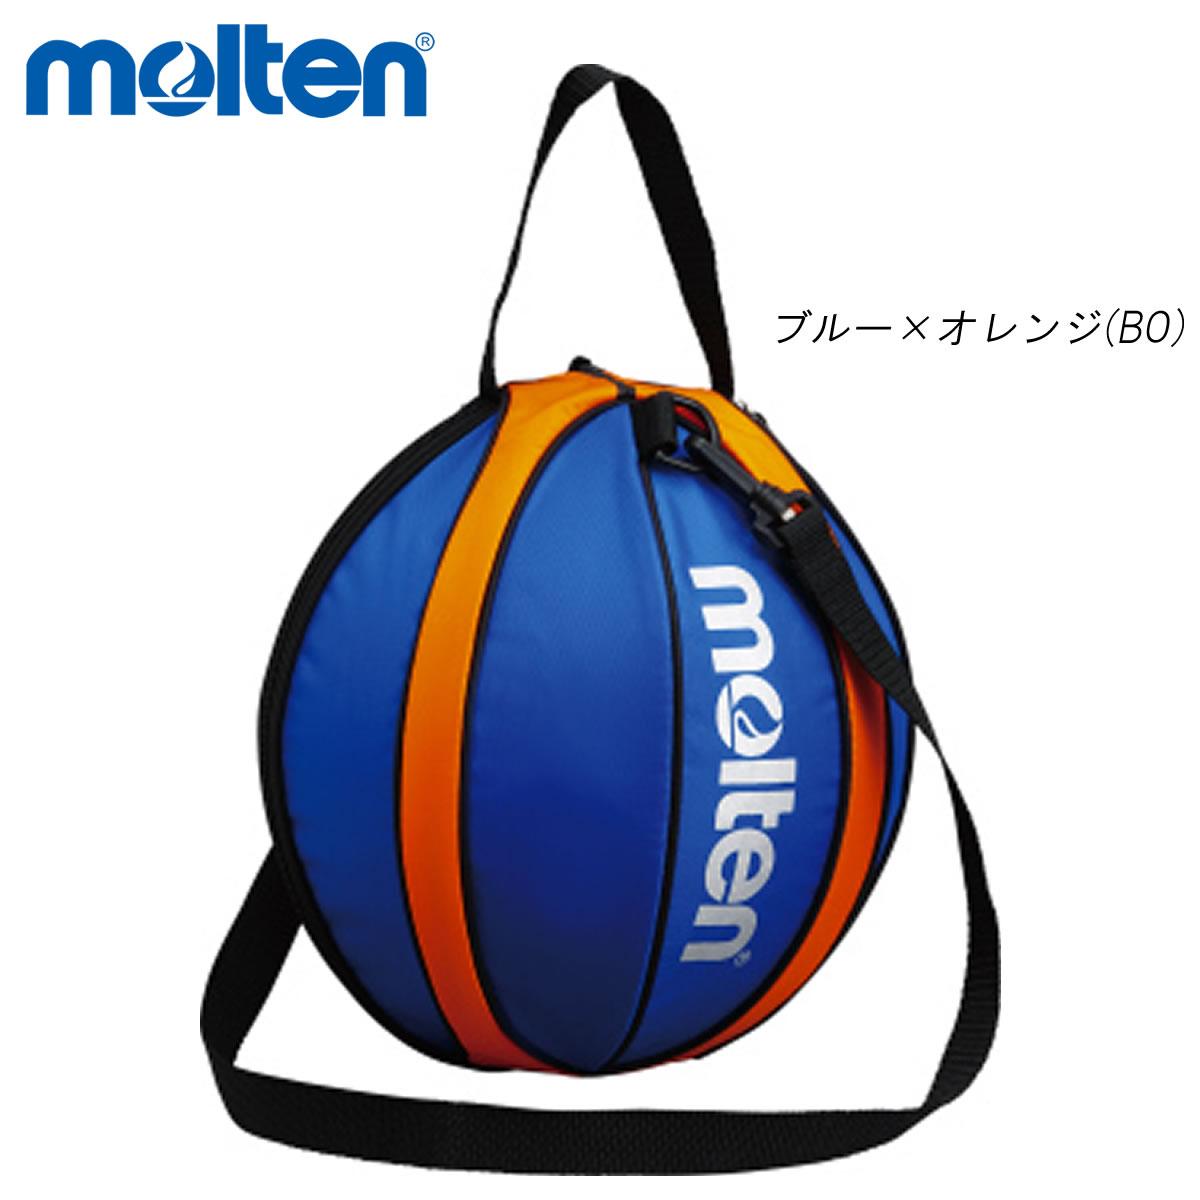 molten NB10BO バスケットボール バッグ バスケットボール1個入れ 海外限定 モルテン 取り寄せ バスケットボールバッグ 1個入れ 今季も再入荷 2021 メール便可